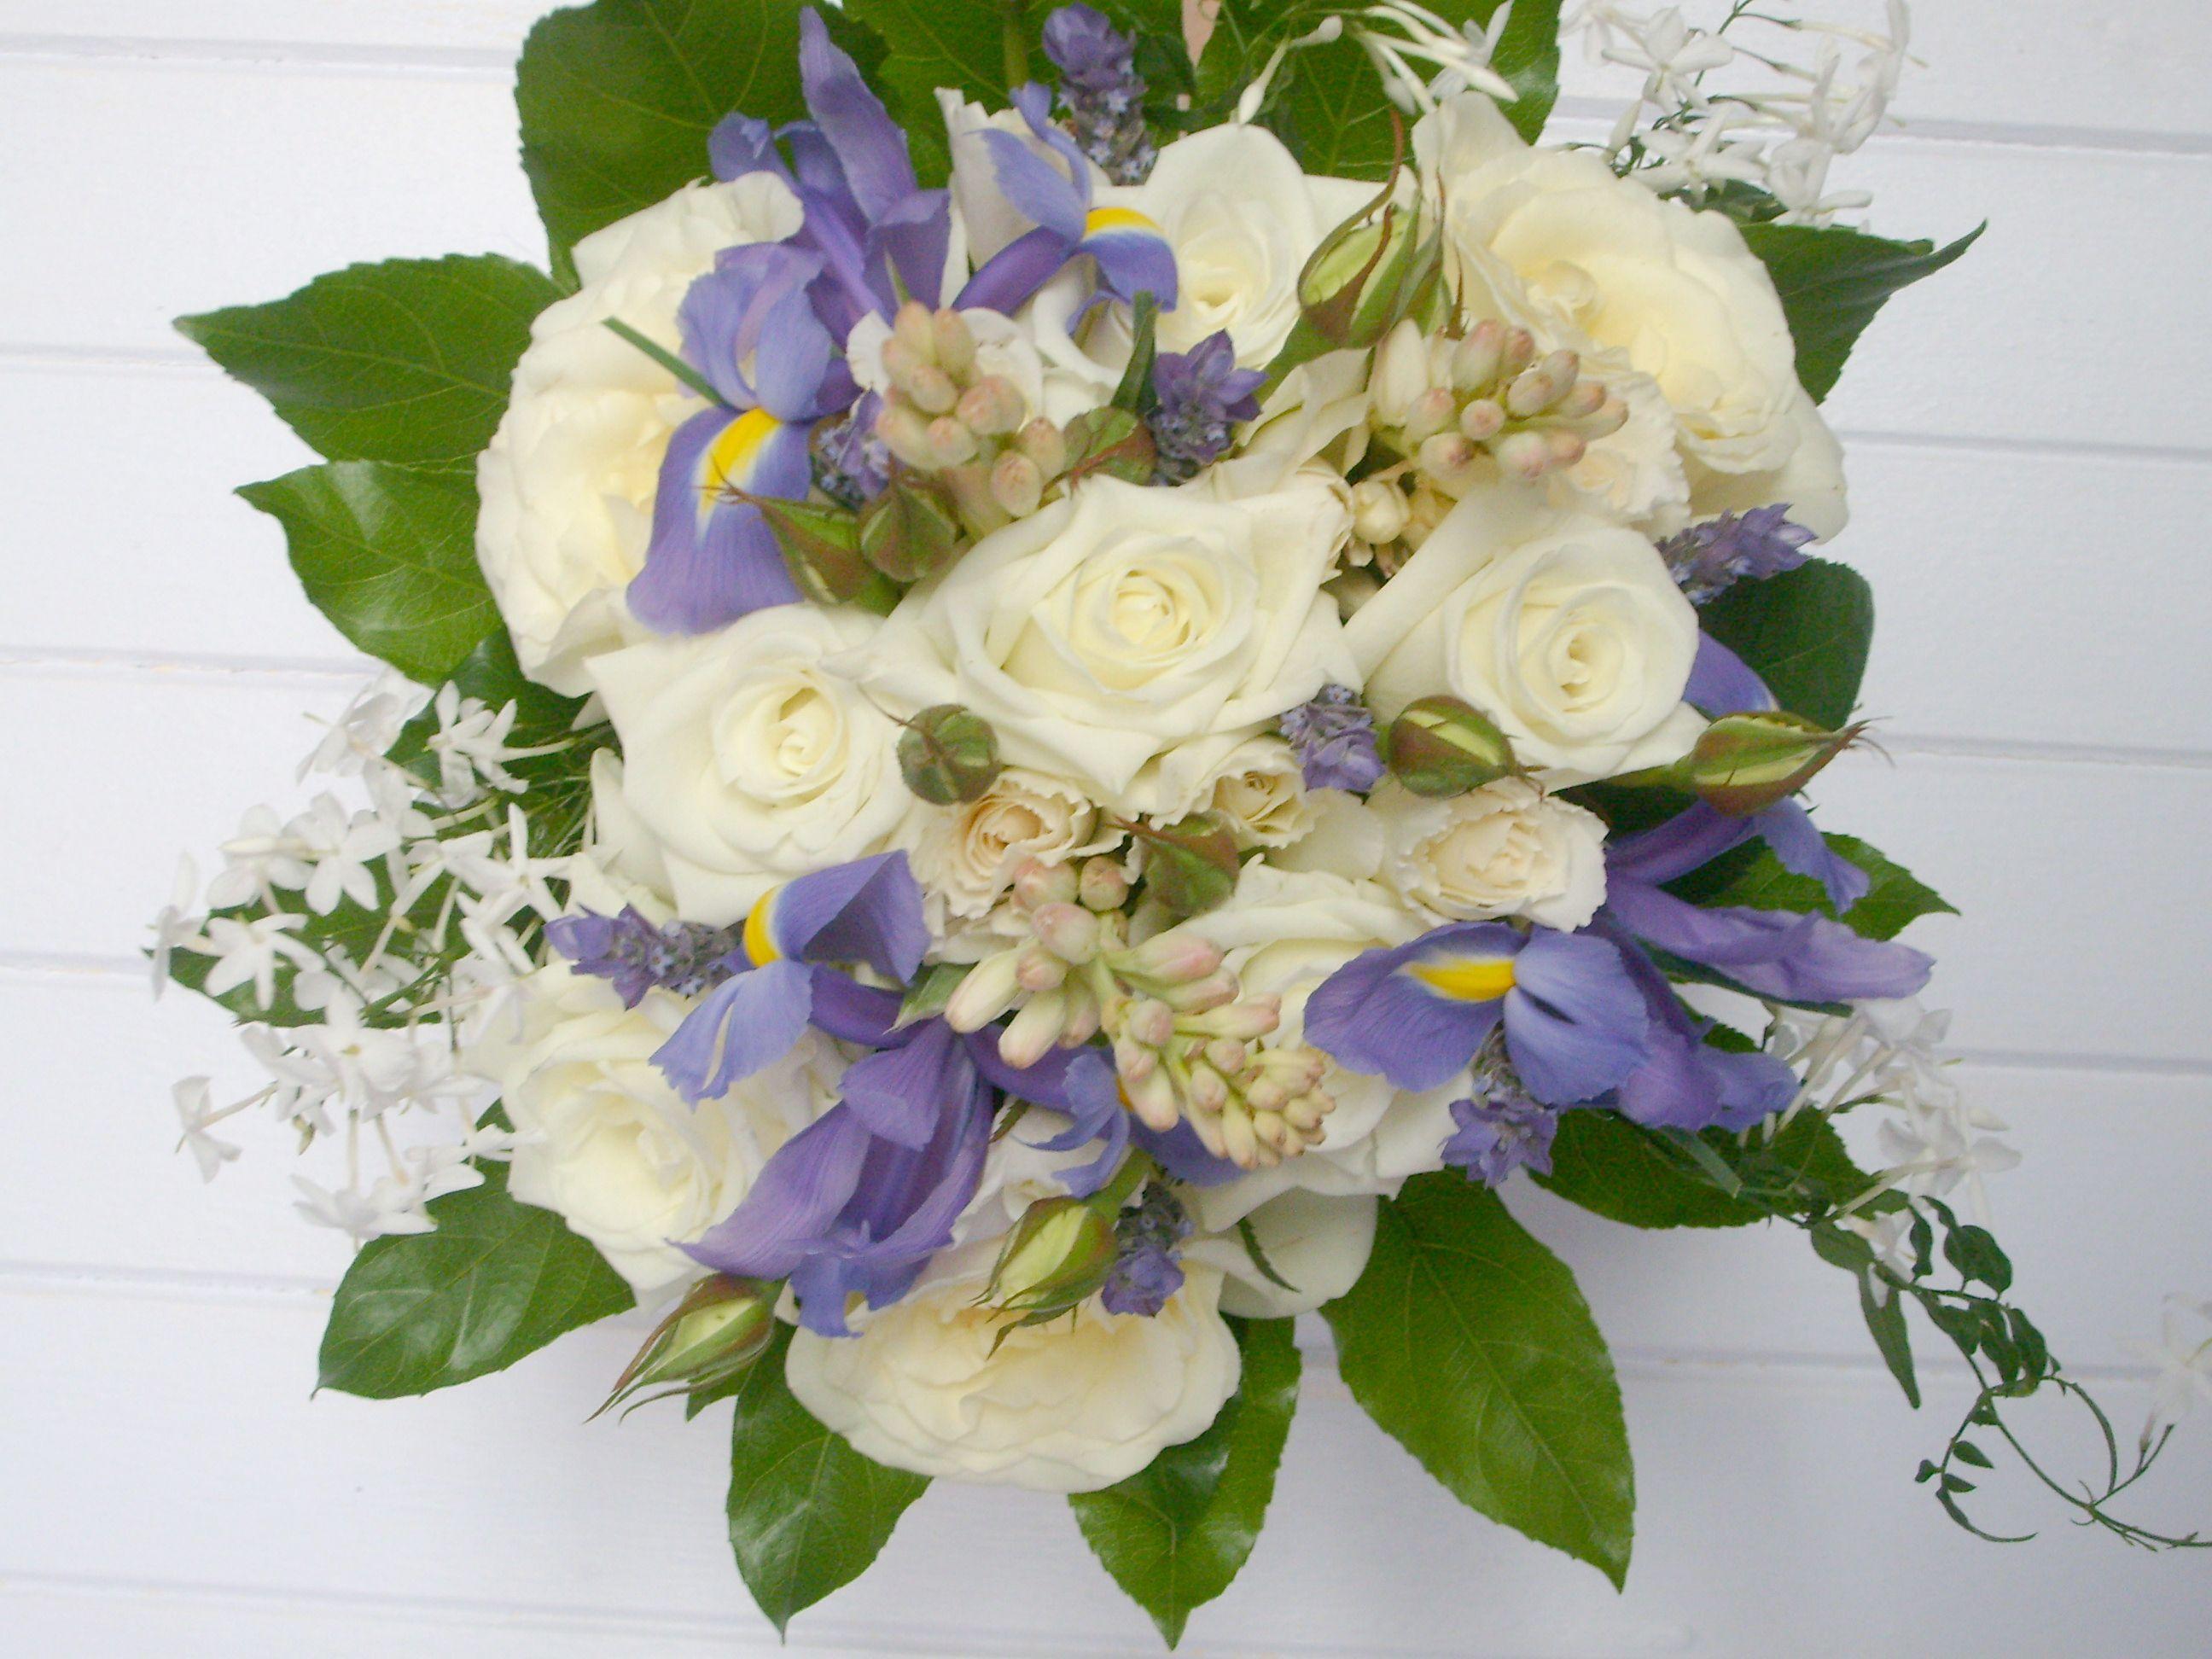 Cheap wedding flowers bouquets wedding flowers pinterest cheap cheap wedding flowers bouquets izmirmasajfo